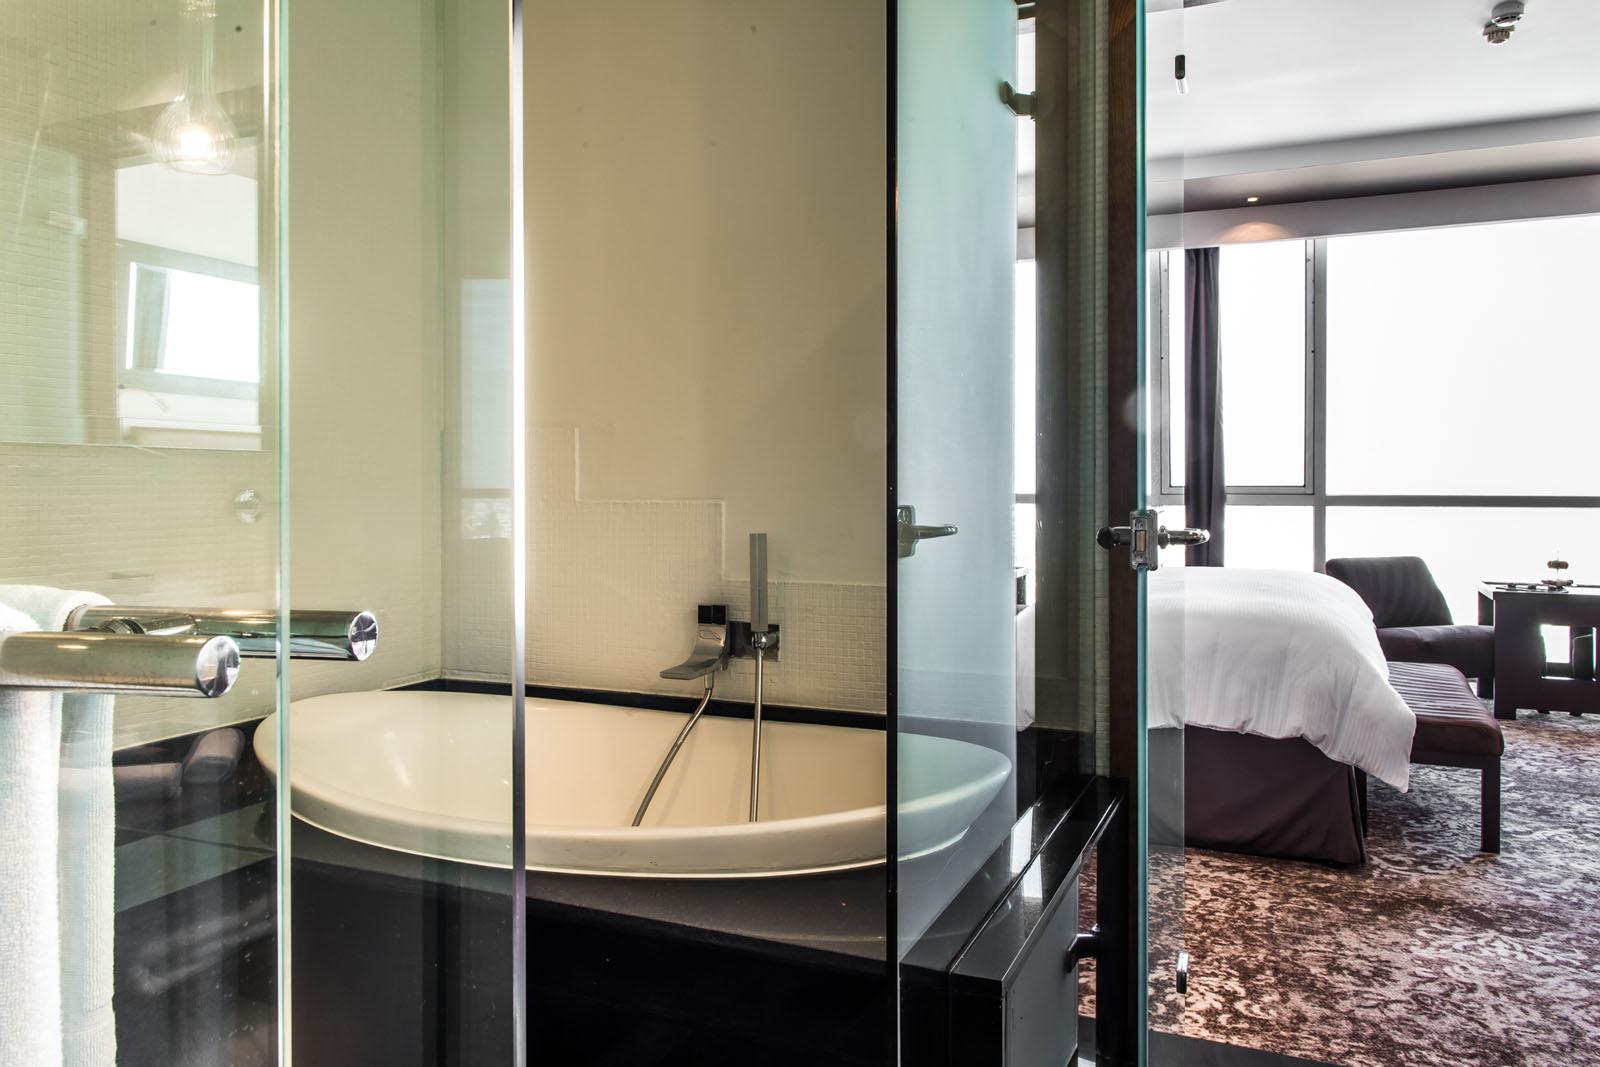 Bathroom at Kenzi Tower Hotel in central Casablanca, Morocco